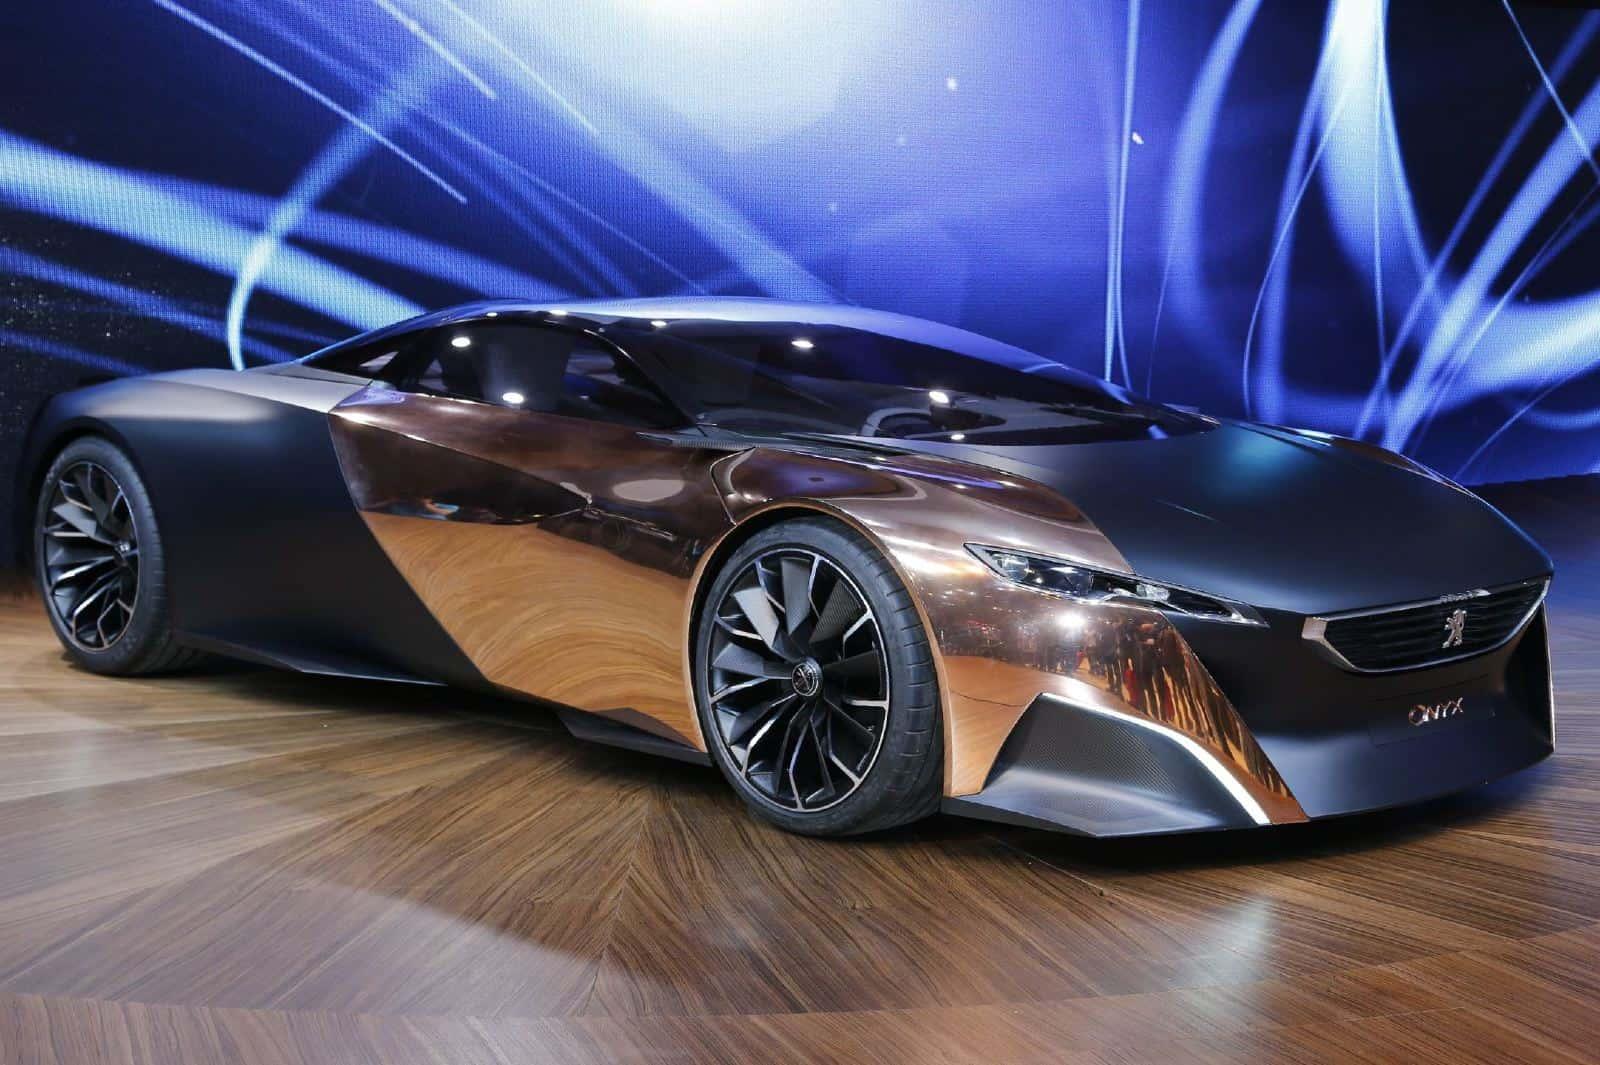 Meet The Designers Peugeot Onyx Concept